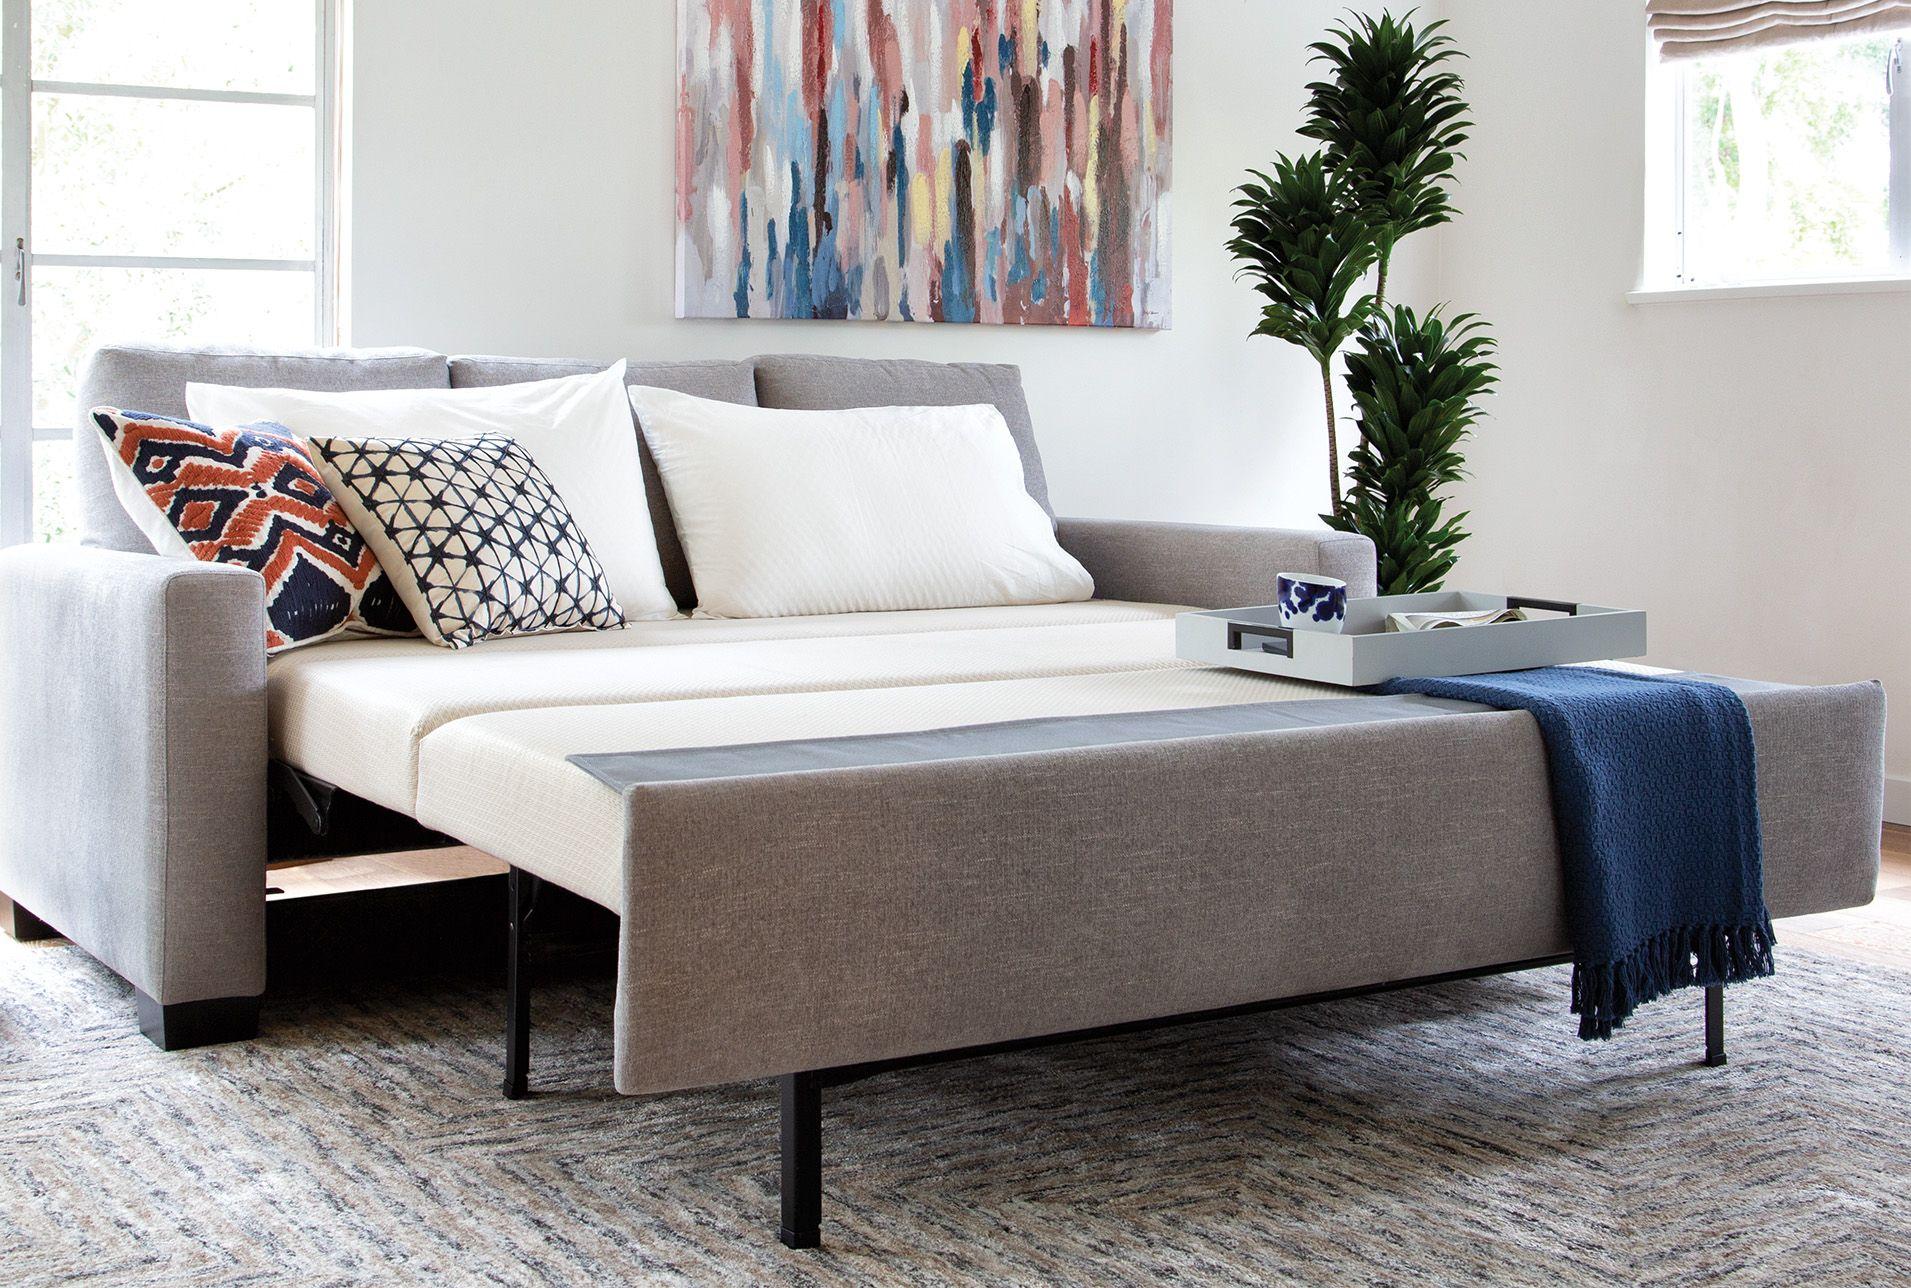 Surprising Queen Plus Sofa Sleeper With Storage Chaise Mackenzie Dailytribune Chair Design For Home Dailytribuneorg